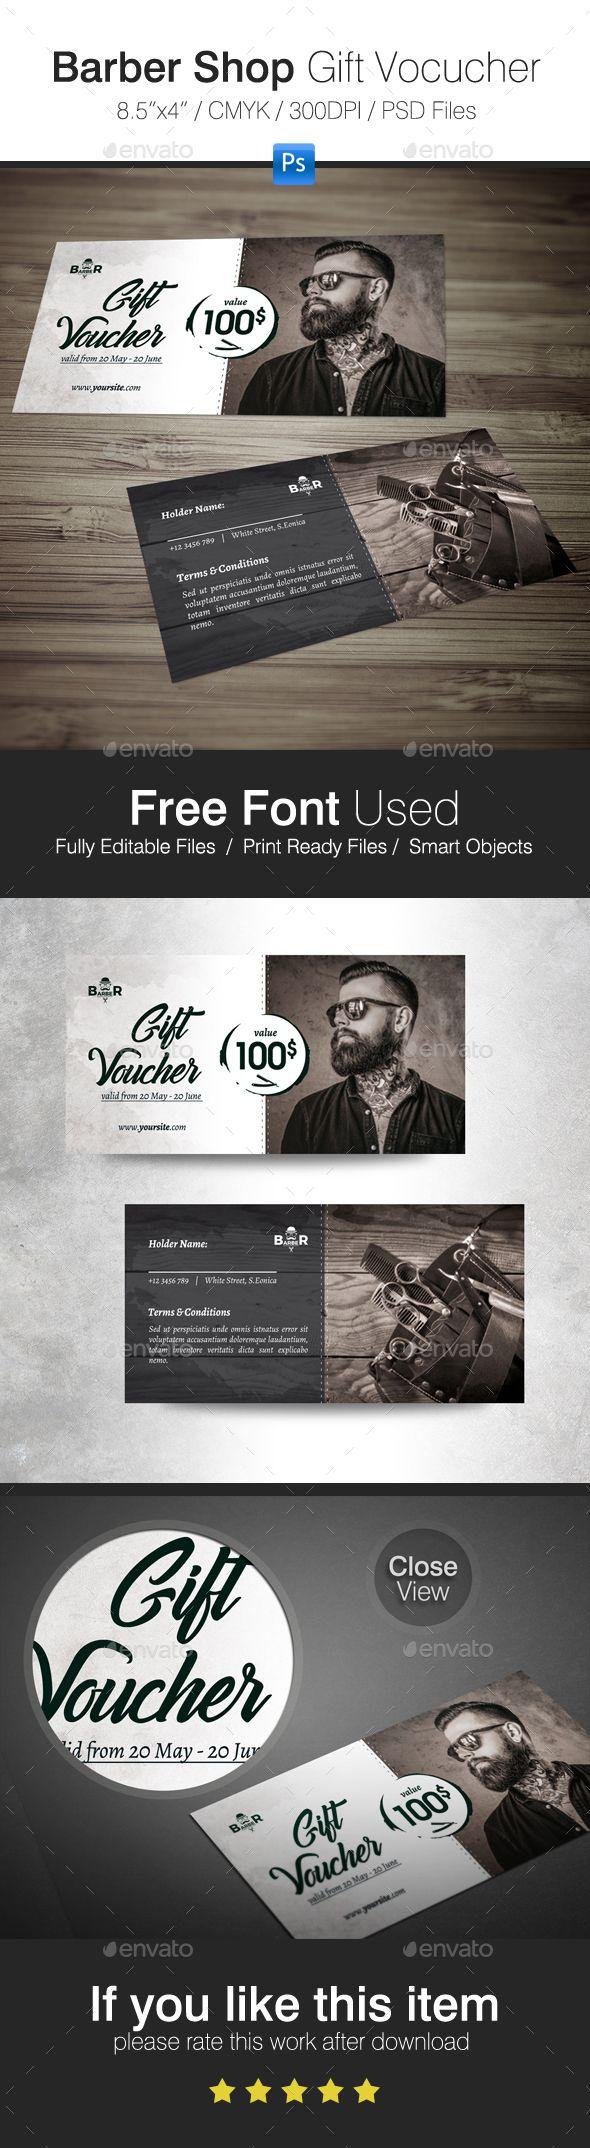 Barber Shop Gift Voucher - Cards & Invites Print Templates